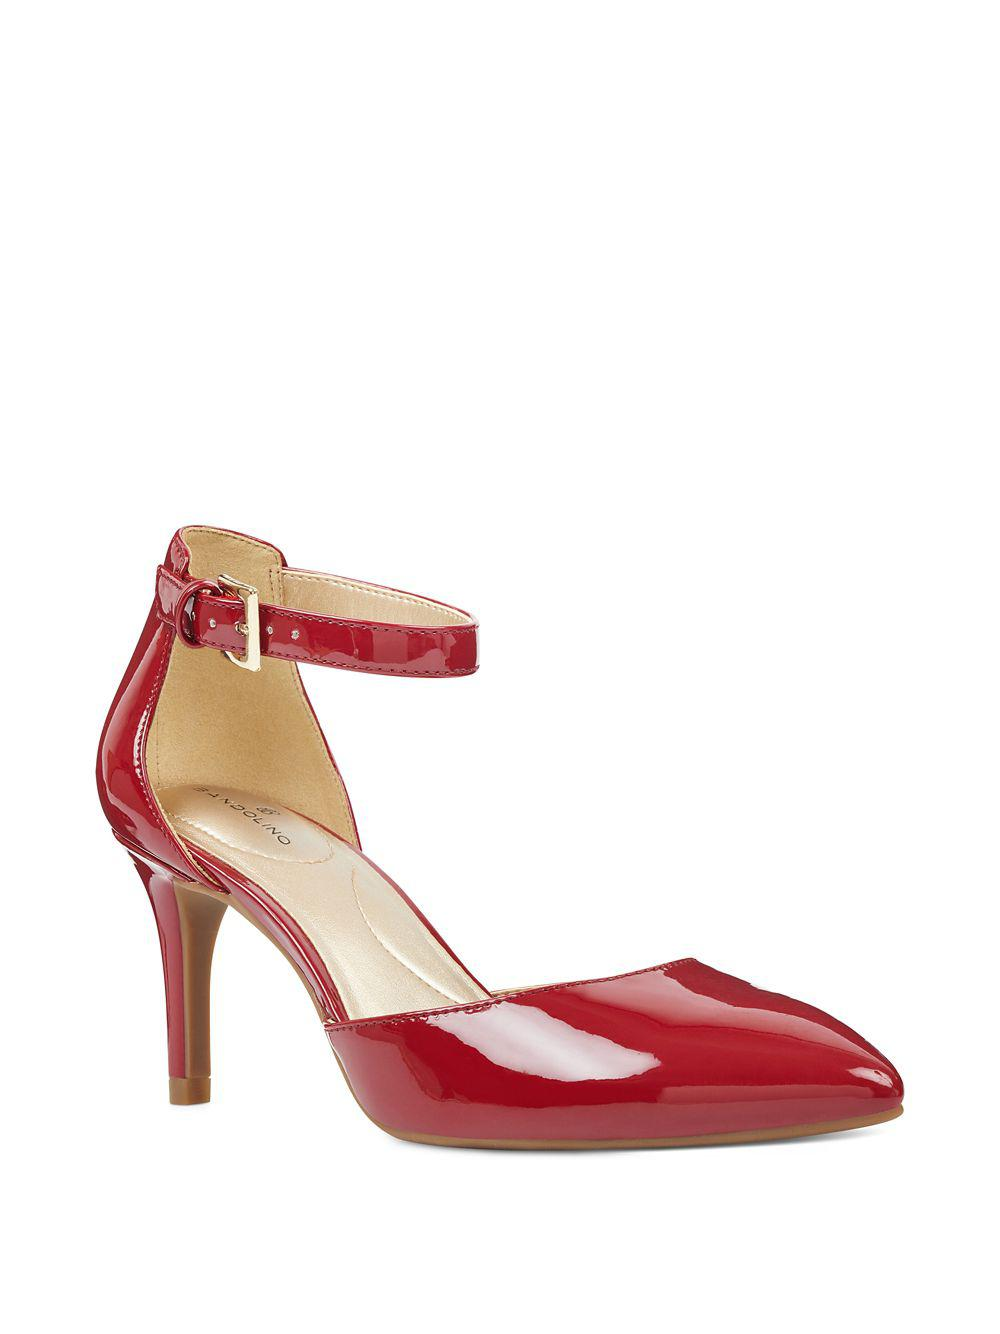 b11c01e11b33 Lyst - Bandolino Ginata Skinny Heel Dorsay Pumps in Red